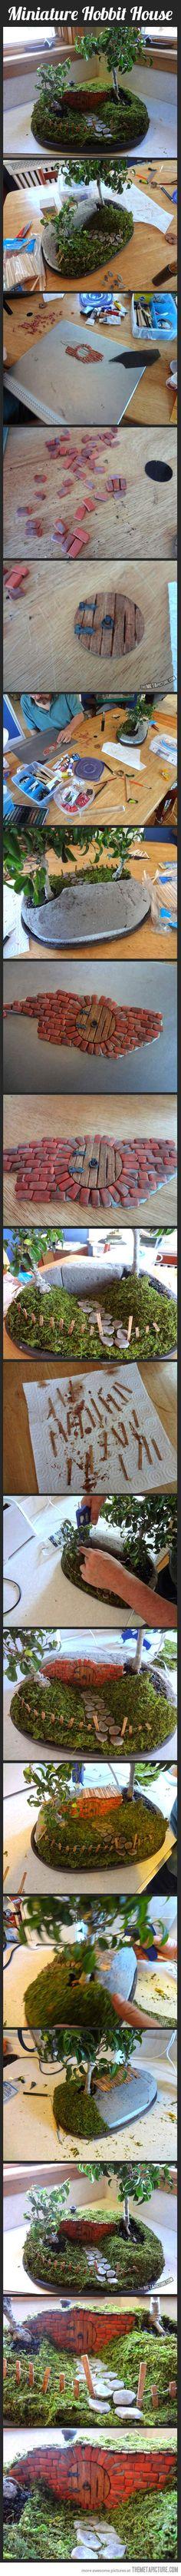 Hobbit house. This would be fun to make! #pin_it @mundodascascas See more Here: www.mundodascasas.com.br